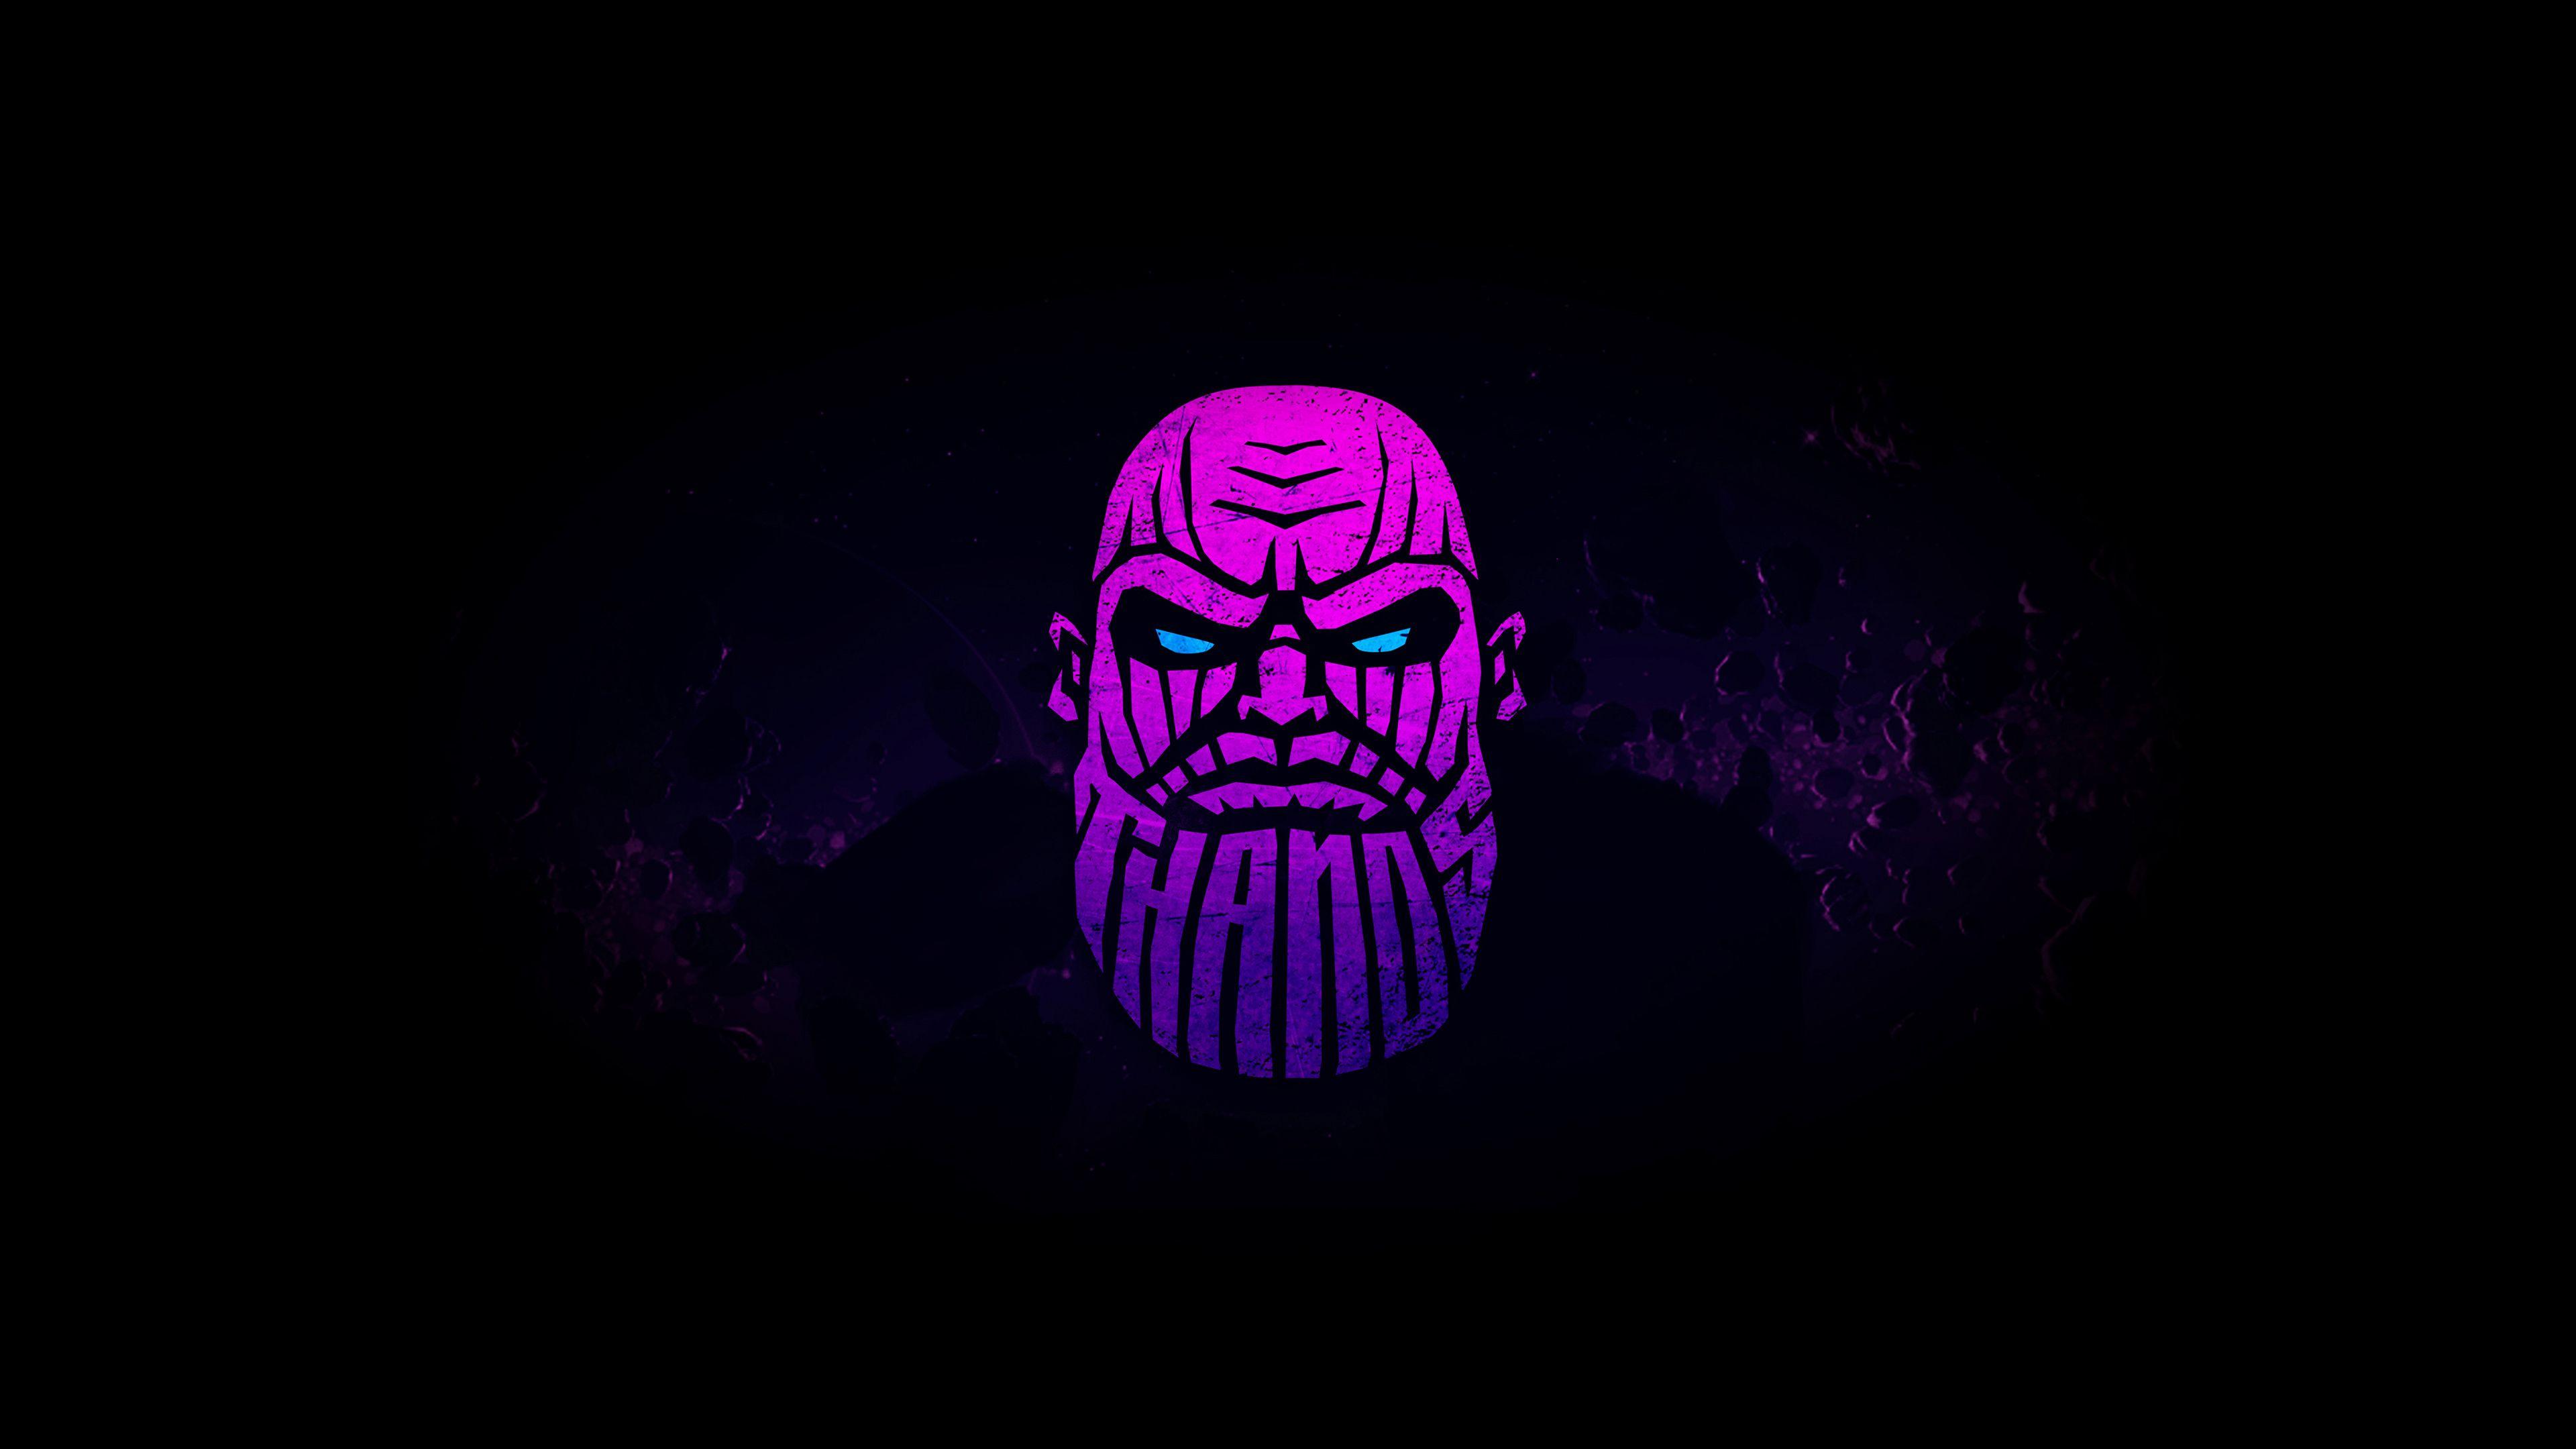 Thanos Minimal Art 4k Thanos Wallpapers Supervillain Wallpapers Minimalist Wallpapers Minimalism Wa Minimalist Wallpaper Artistic Wallpaper Marvel Wallpaper